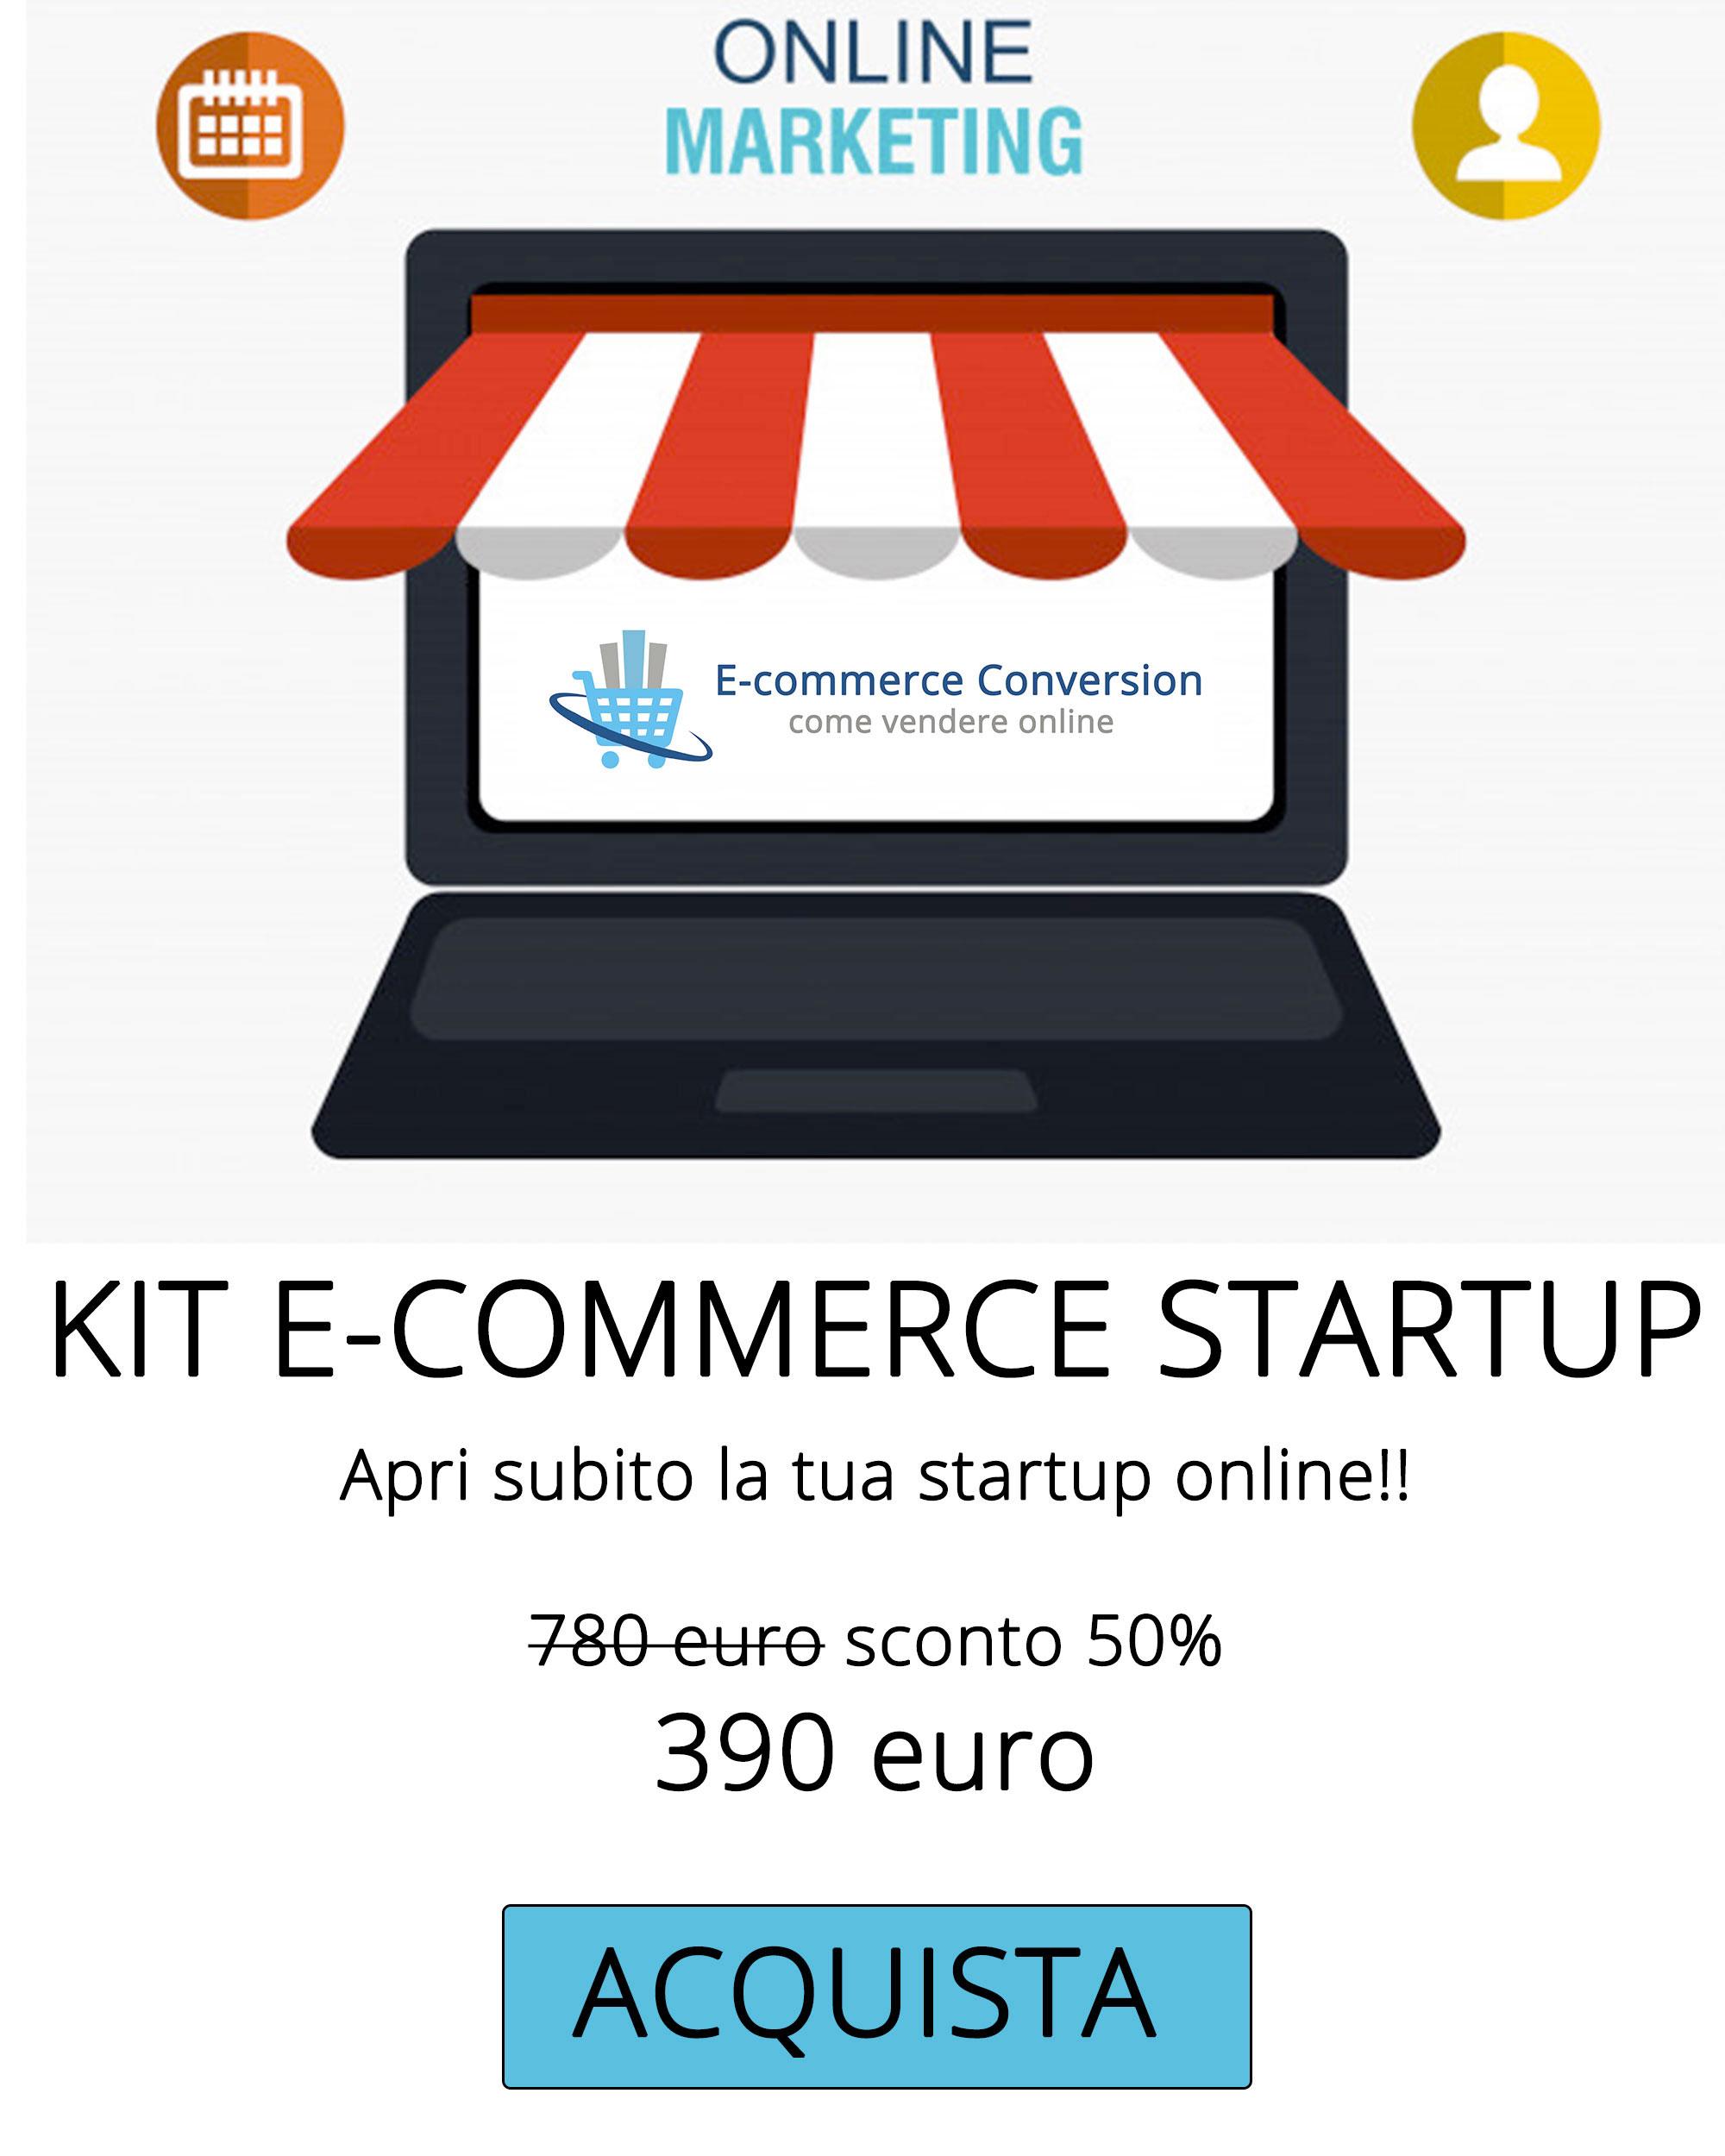 https://www.e-conversion.it/wp-content/uploads/2021/04/kit-incubatore-ecommerce-startup-top.jpg